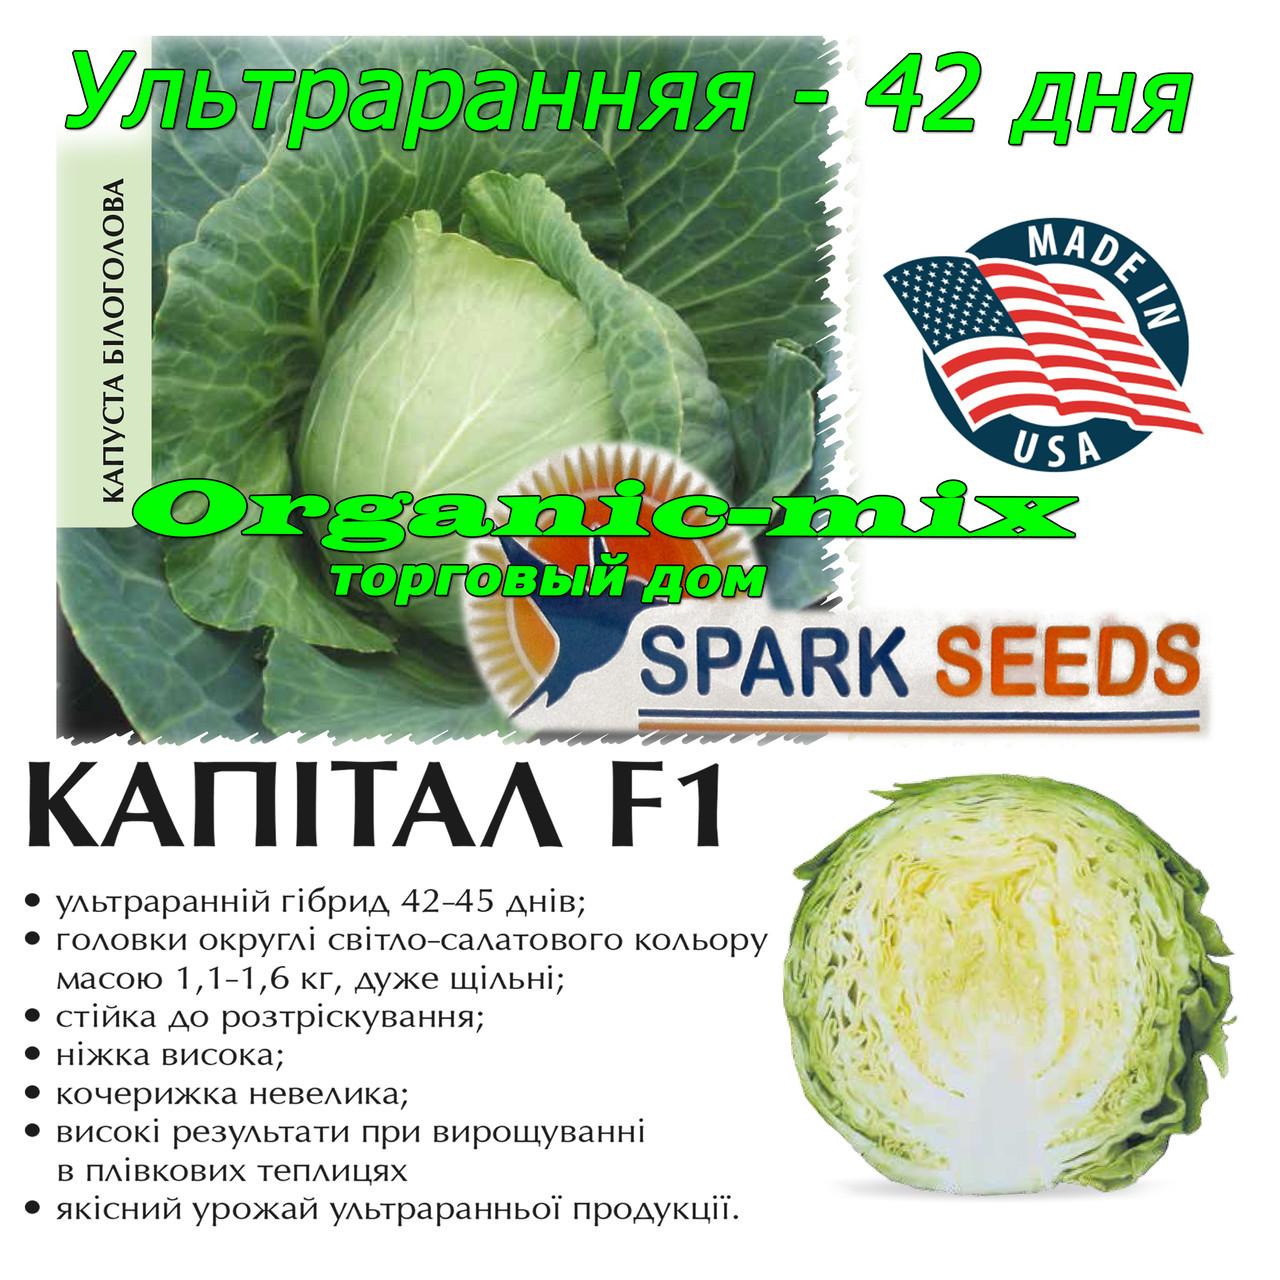 Капуста ранняя Капитал F1 (Lark seeds, США), проф.пакет 1000 семян